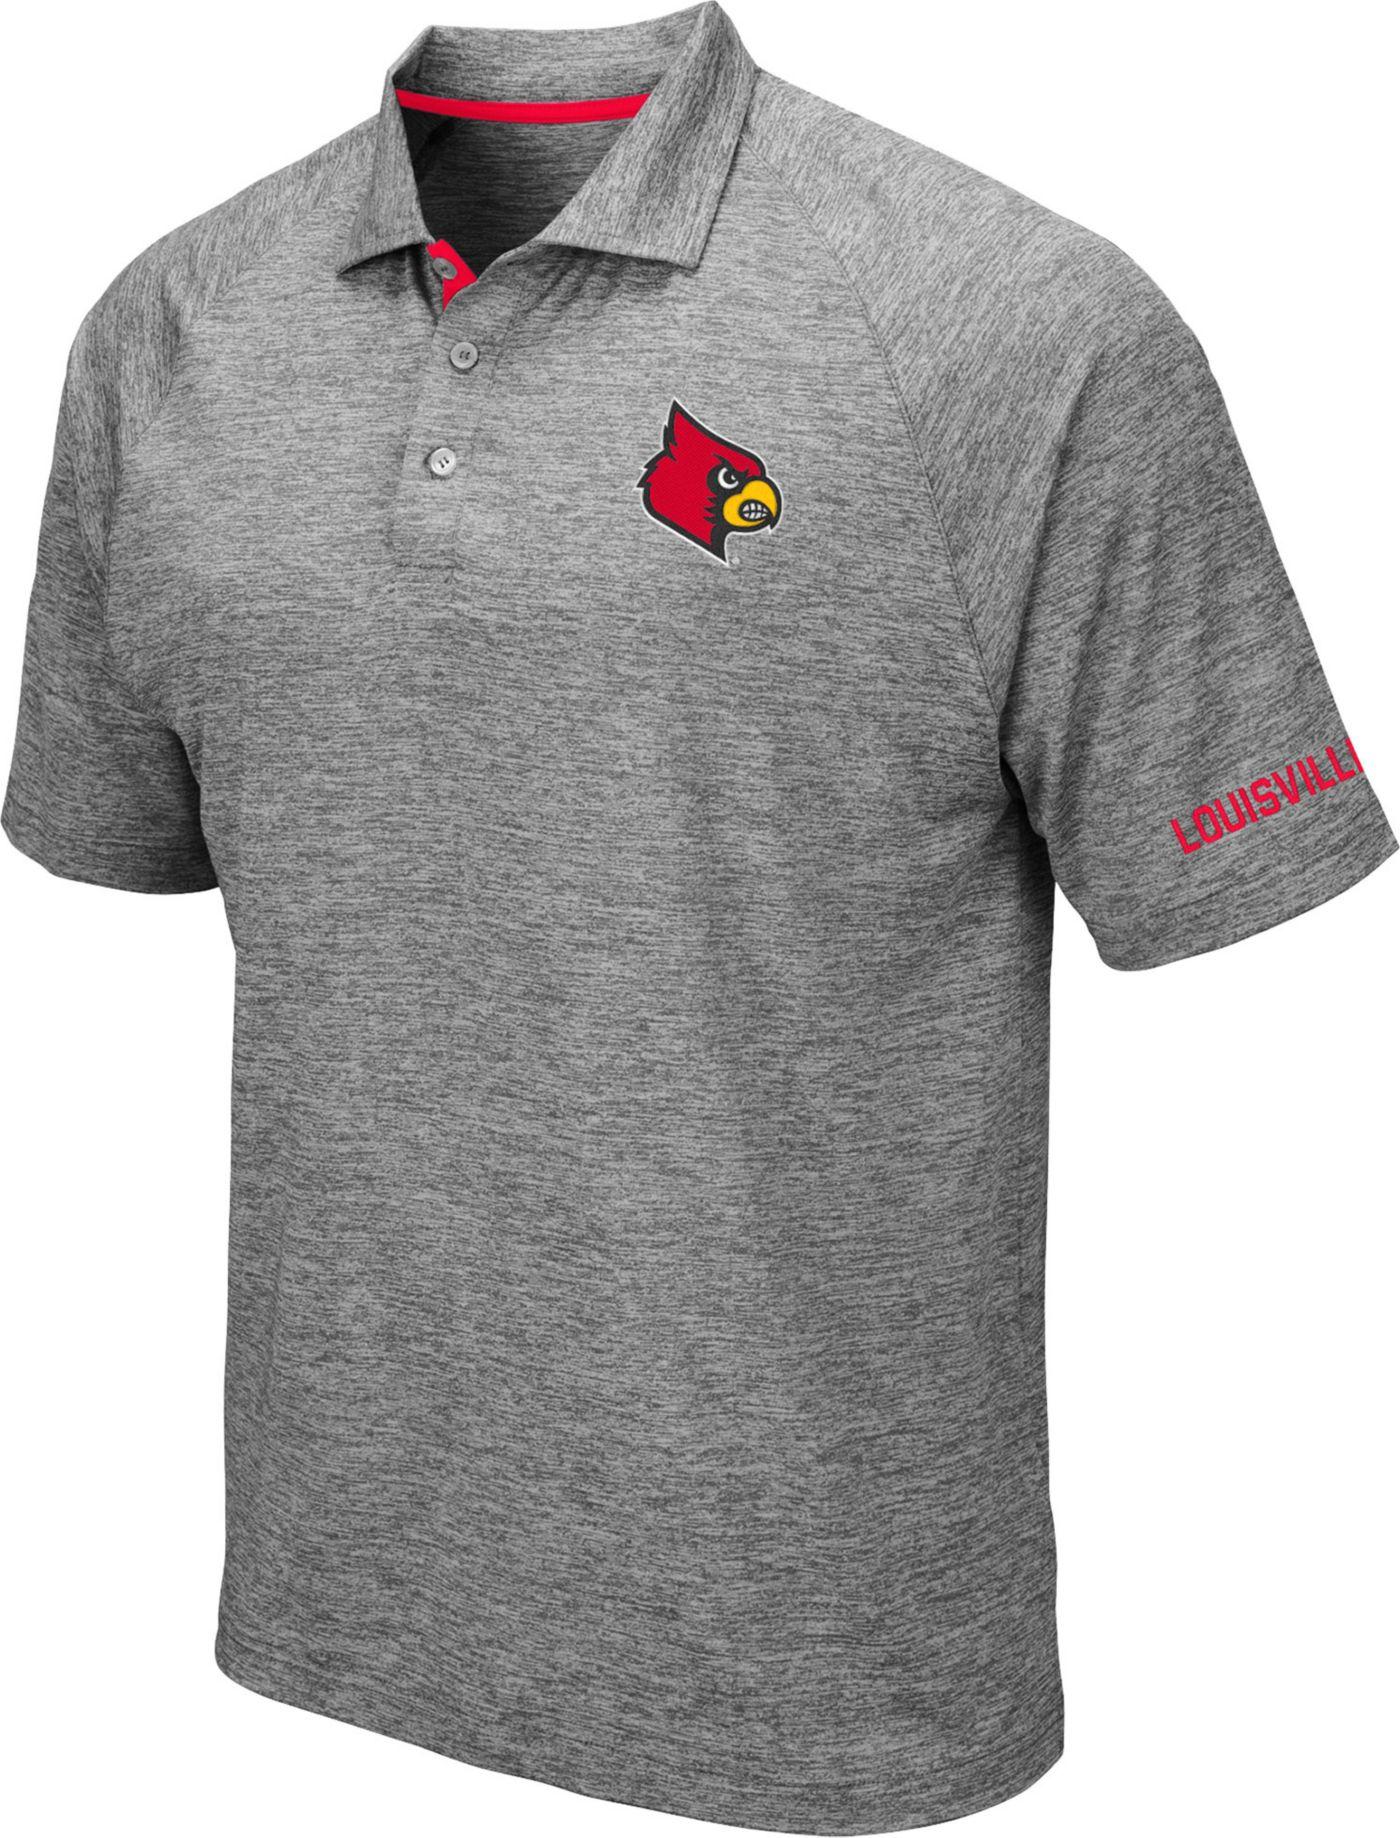 Colosseum Men's Louisville Cardinals Grey Chip Shot Polo